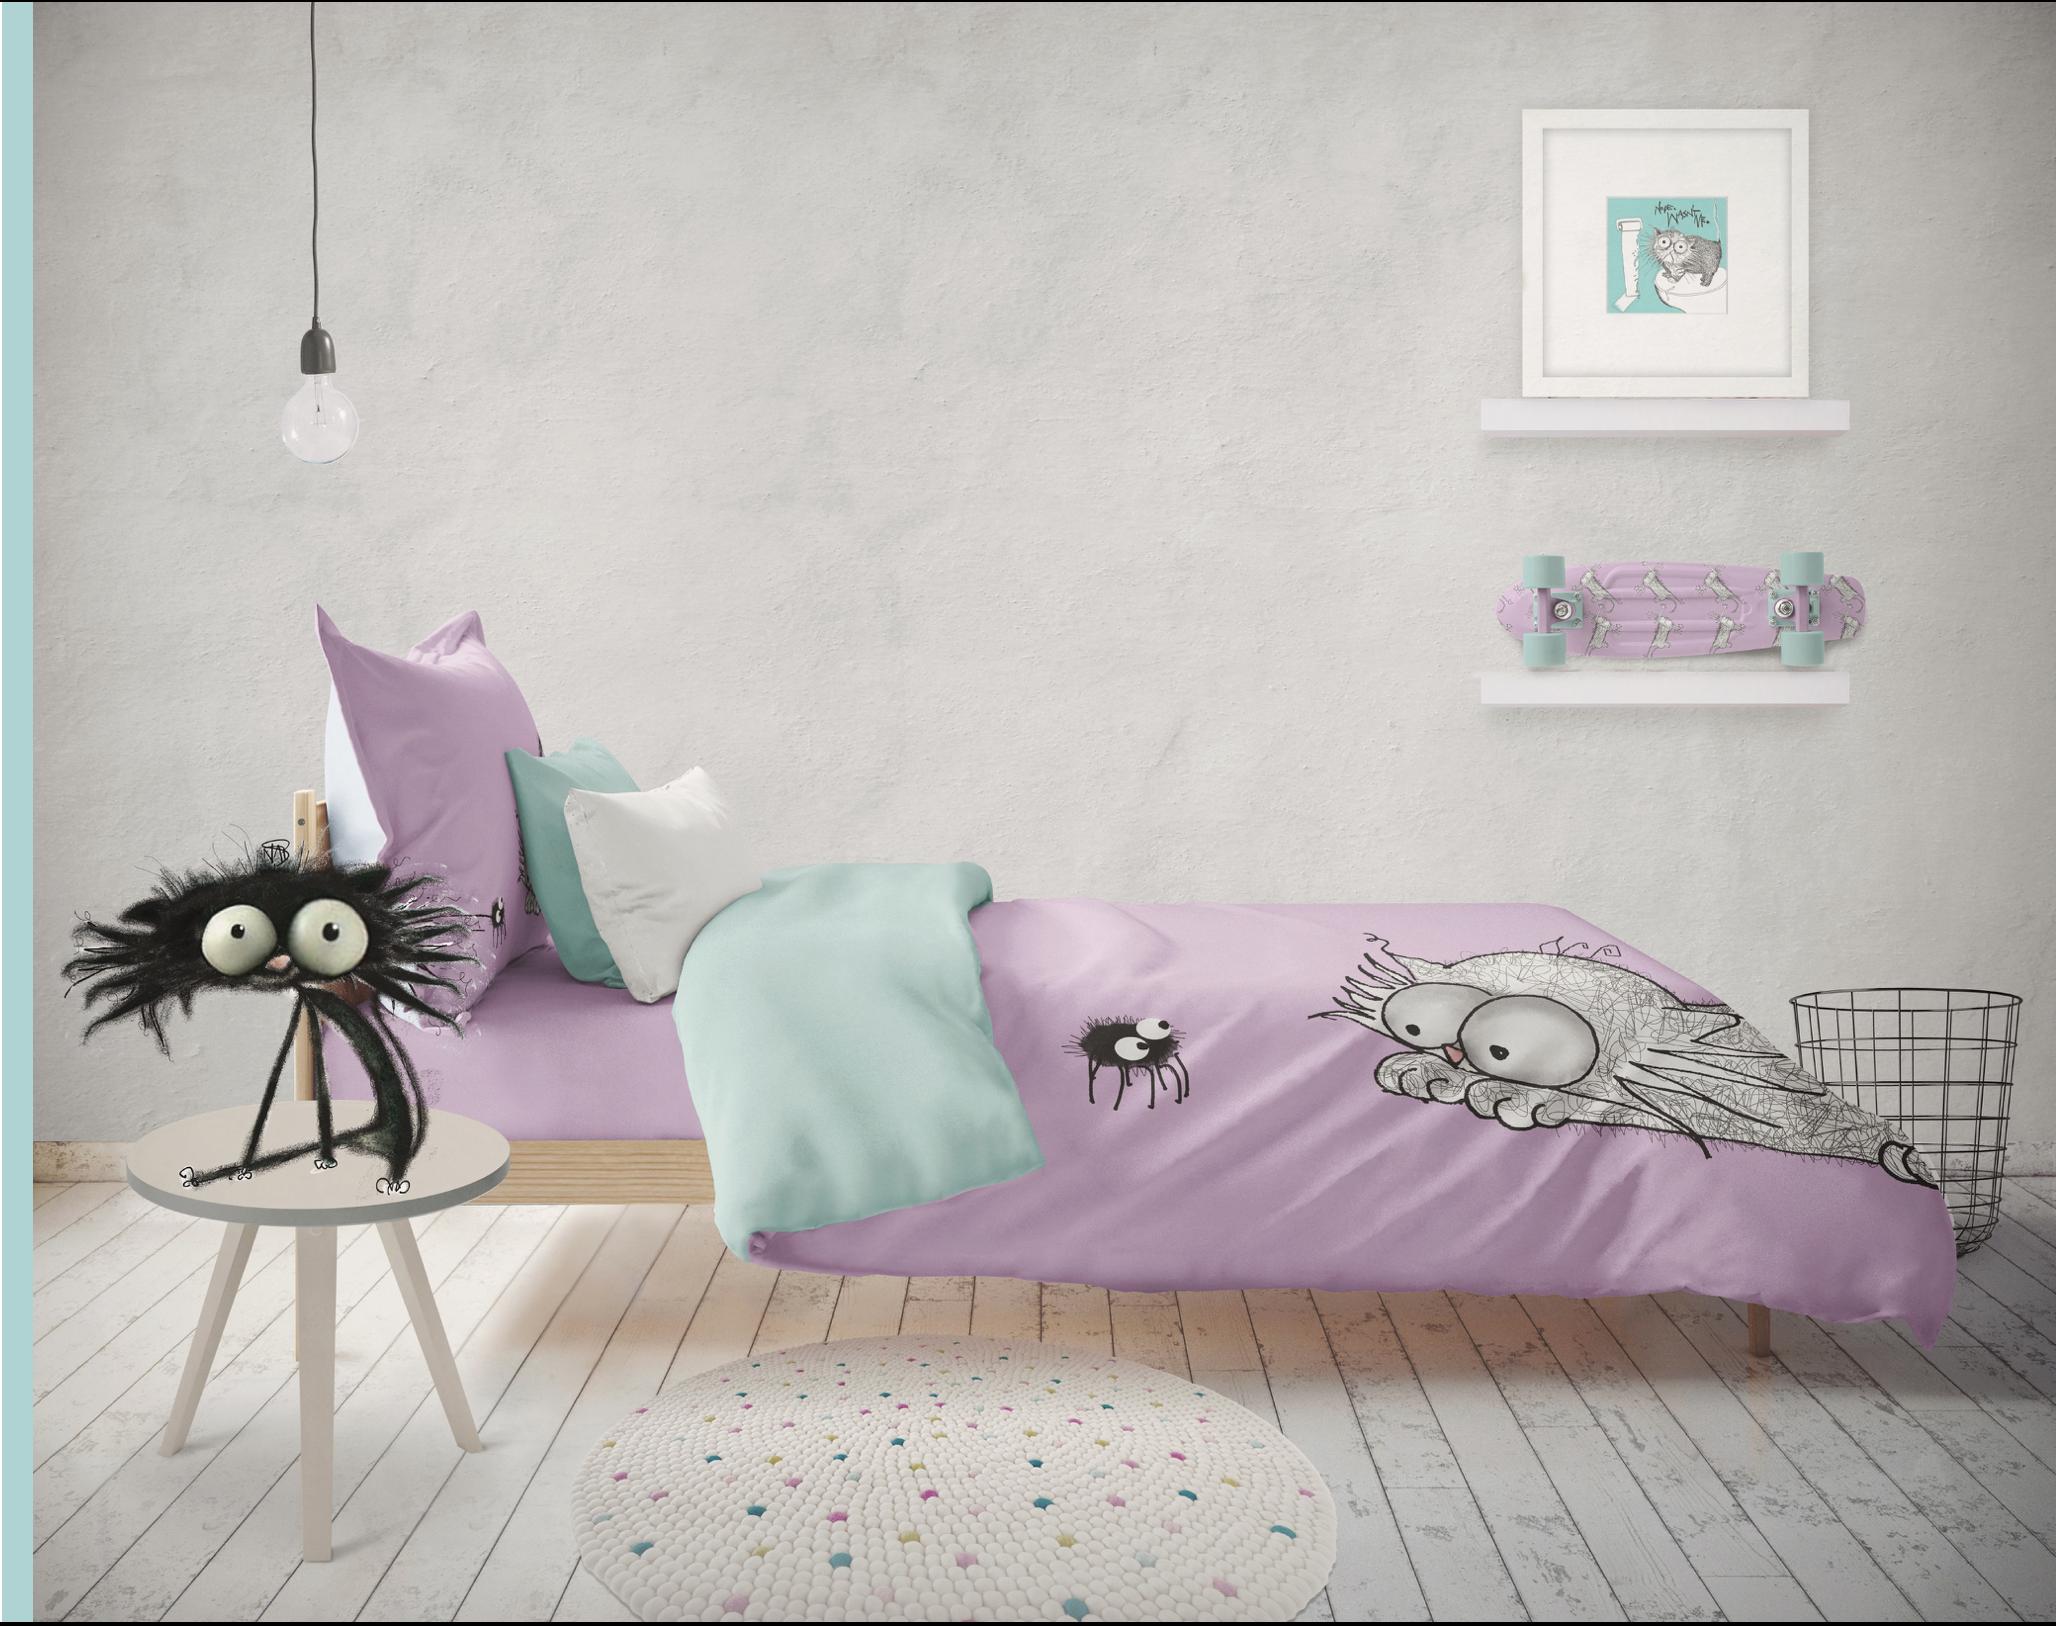 CAT DONT CARE | CAT & SPIDER DUVET - GIRLS BEDROOM | NATALIE PALMER SUTTON | ILLUSTRATION | GIFTS FOR CRAZY CAT LOVERS